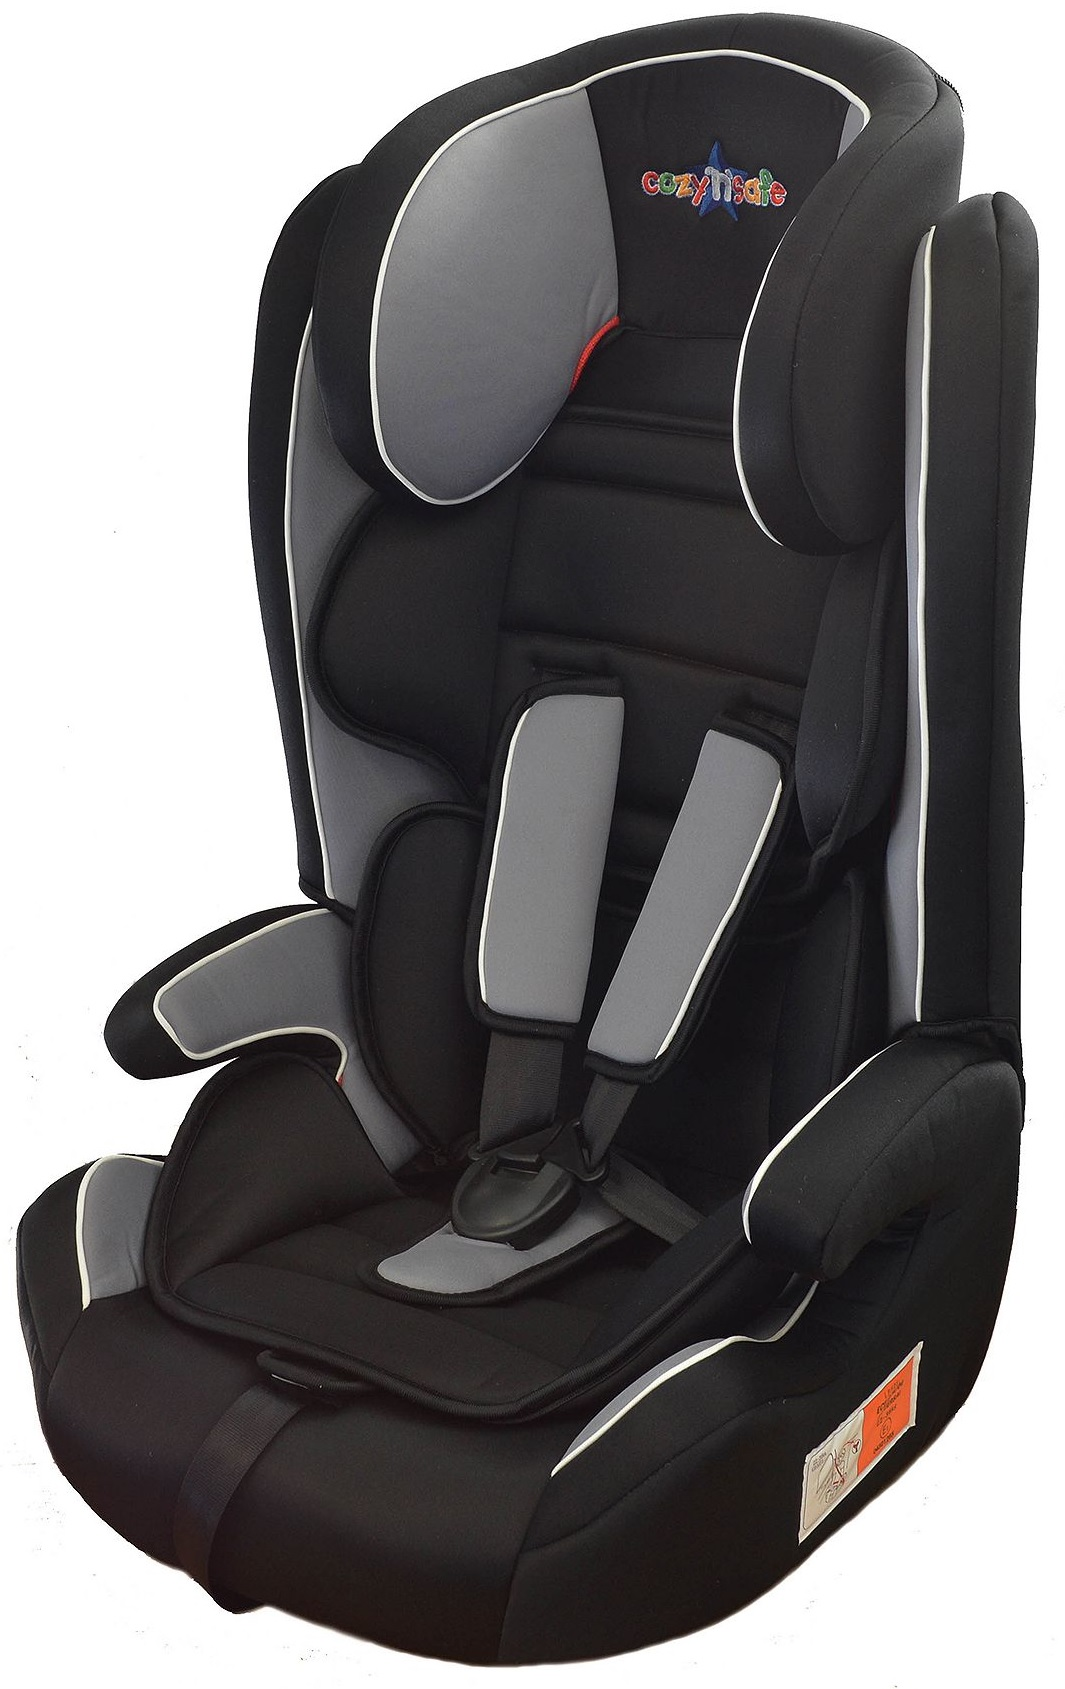 new cozy 39 n 39 safe fuji high back booster car seat with harness group 1 2 3 ebay. Black Bedroom Furniture Sets. Home Design Ideas